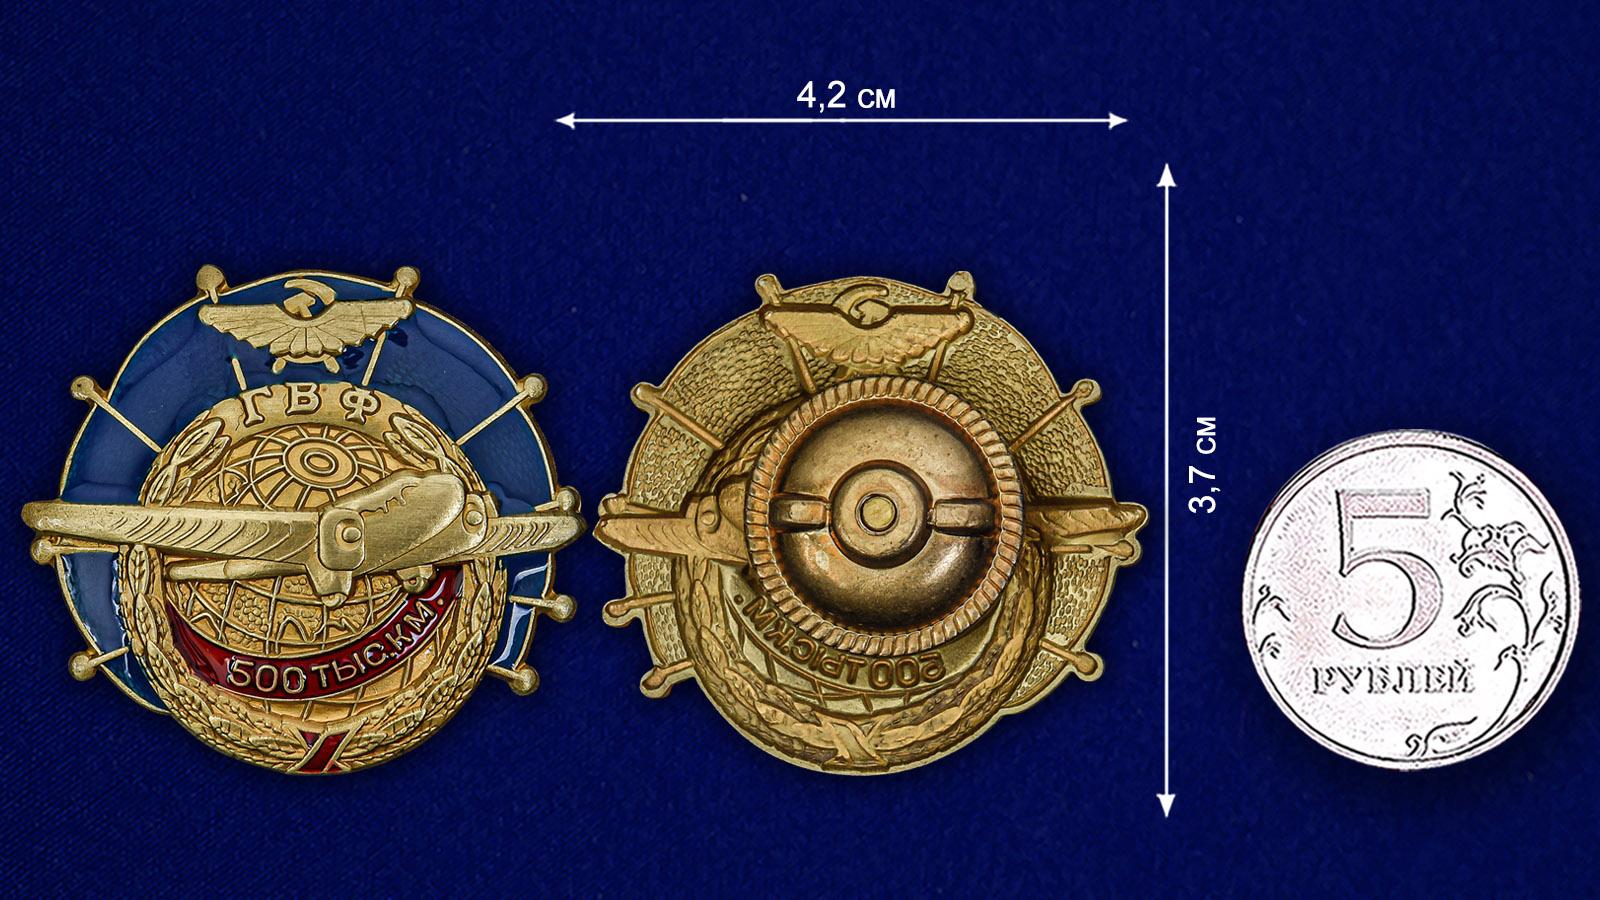 Знак ГВФ За налет 500 тыс. км (бронза) - размер